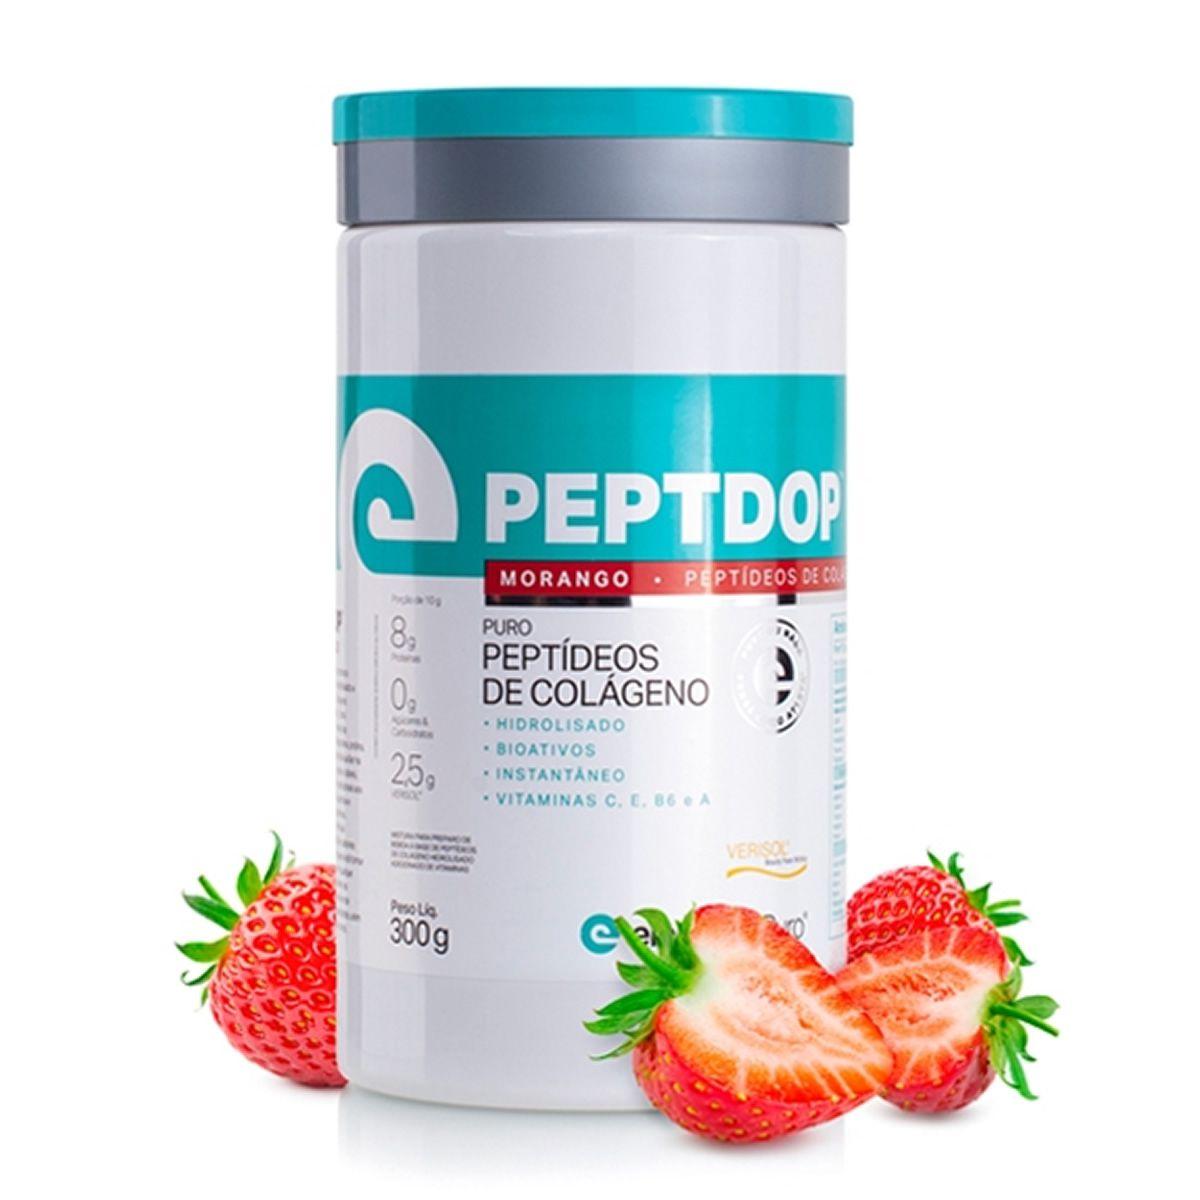 Peptdop Colágeno Hidrolisado 300g Elemento Puro - Morango